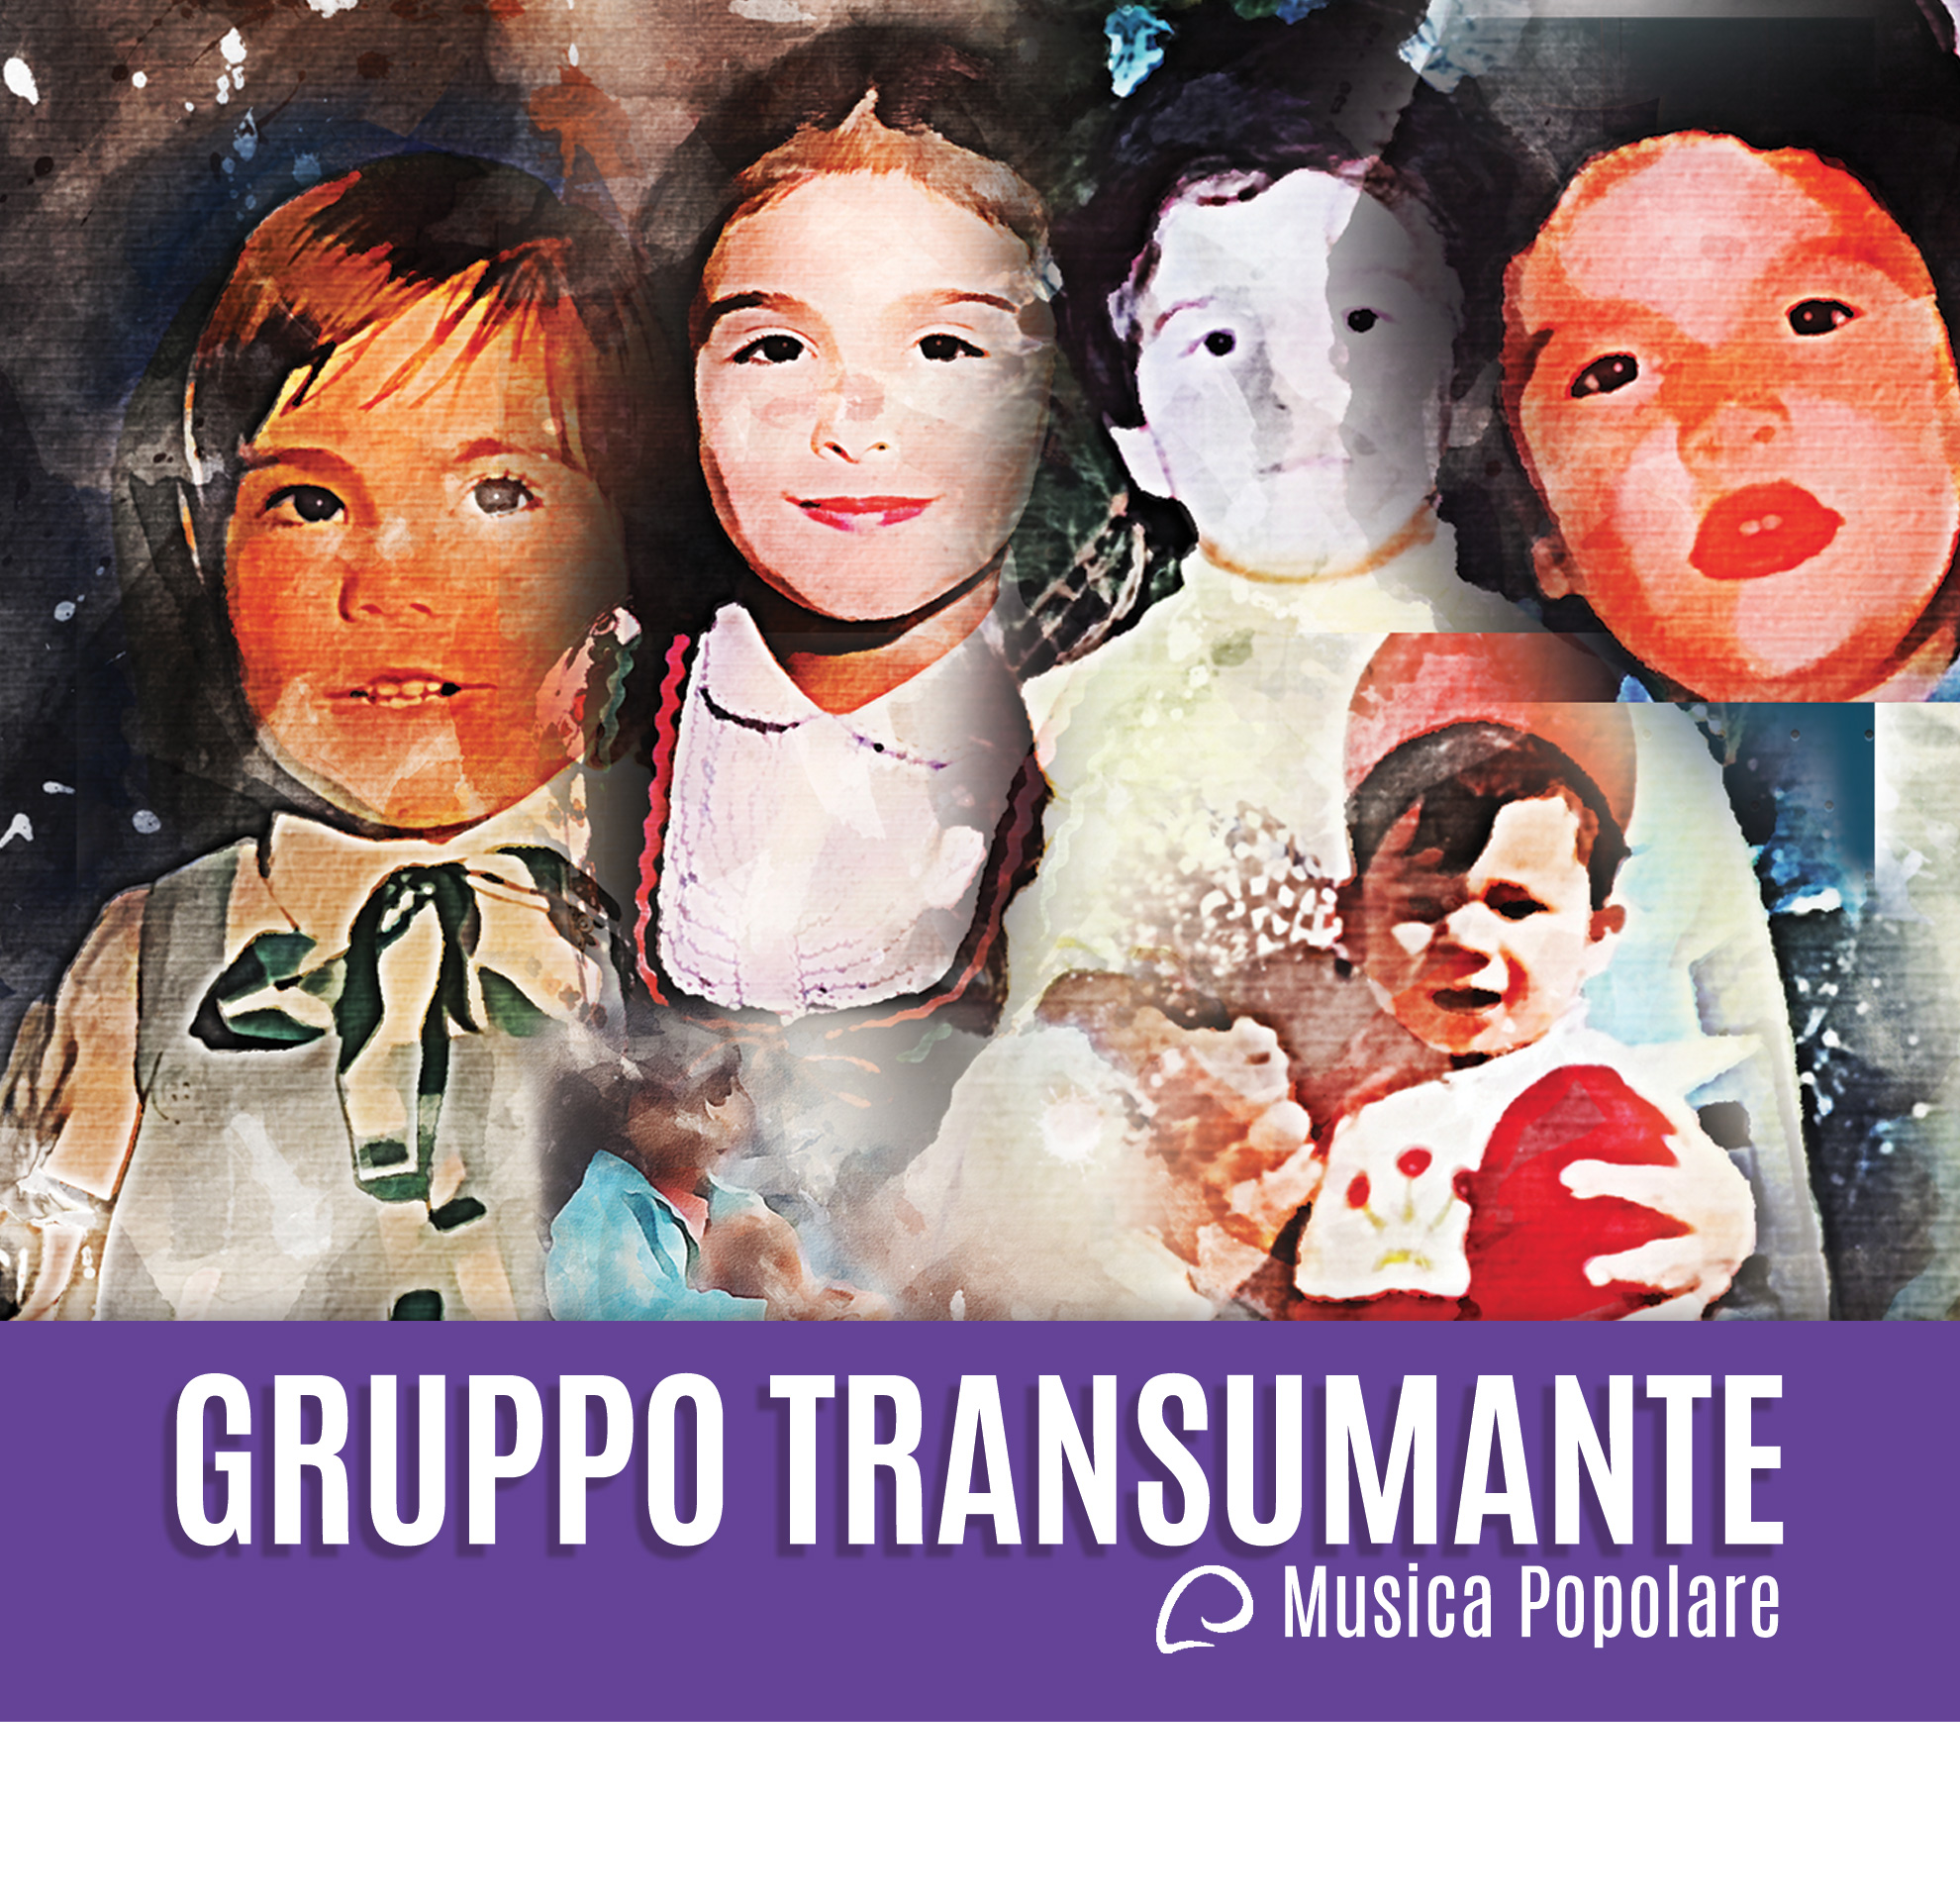 gruppo-transumante